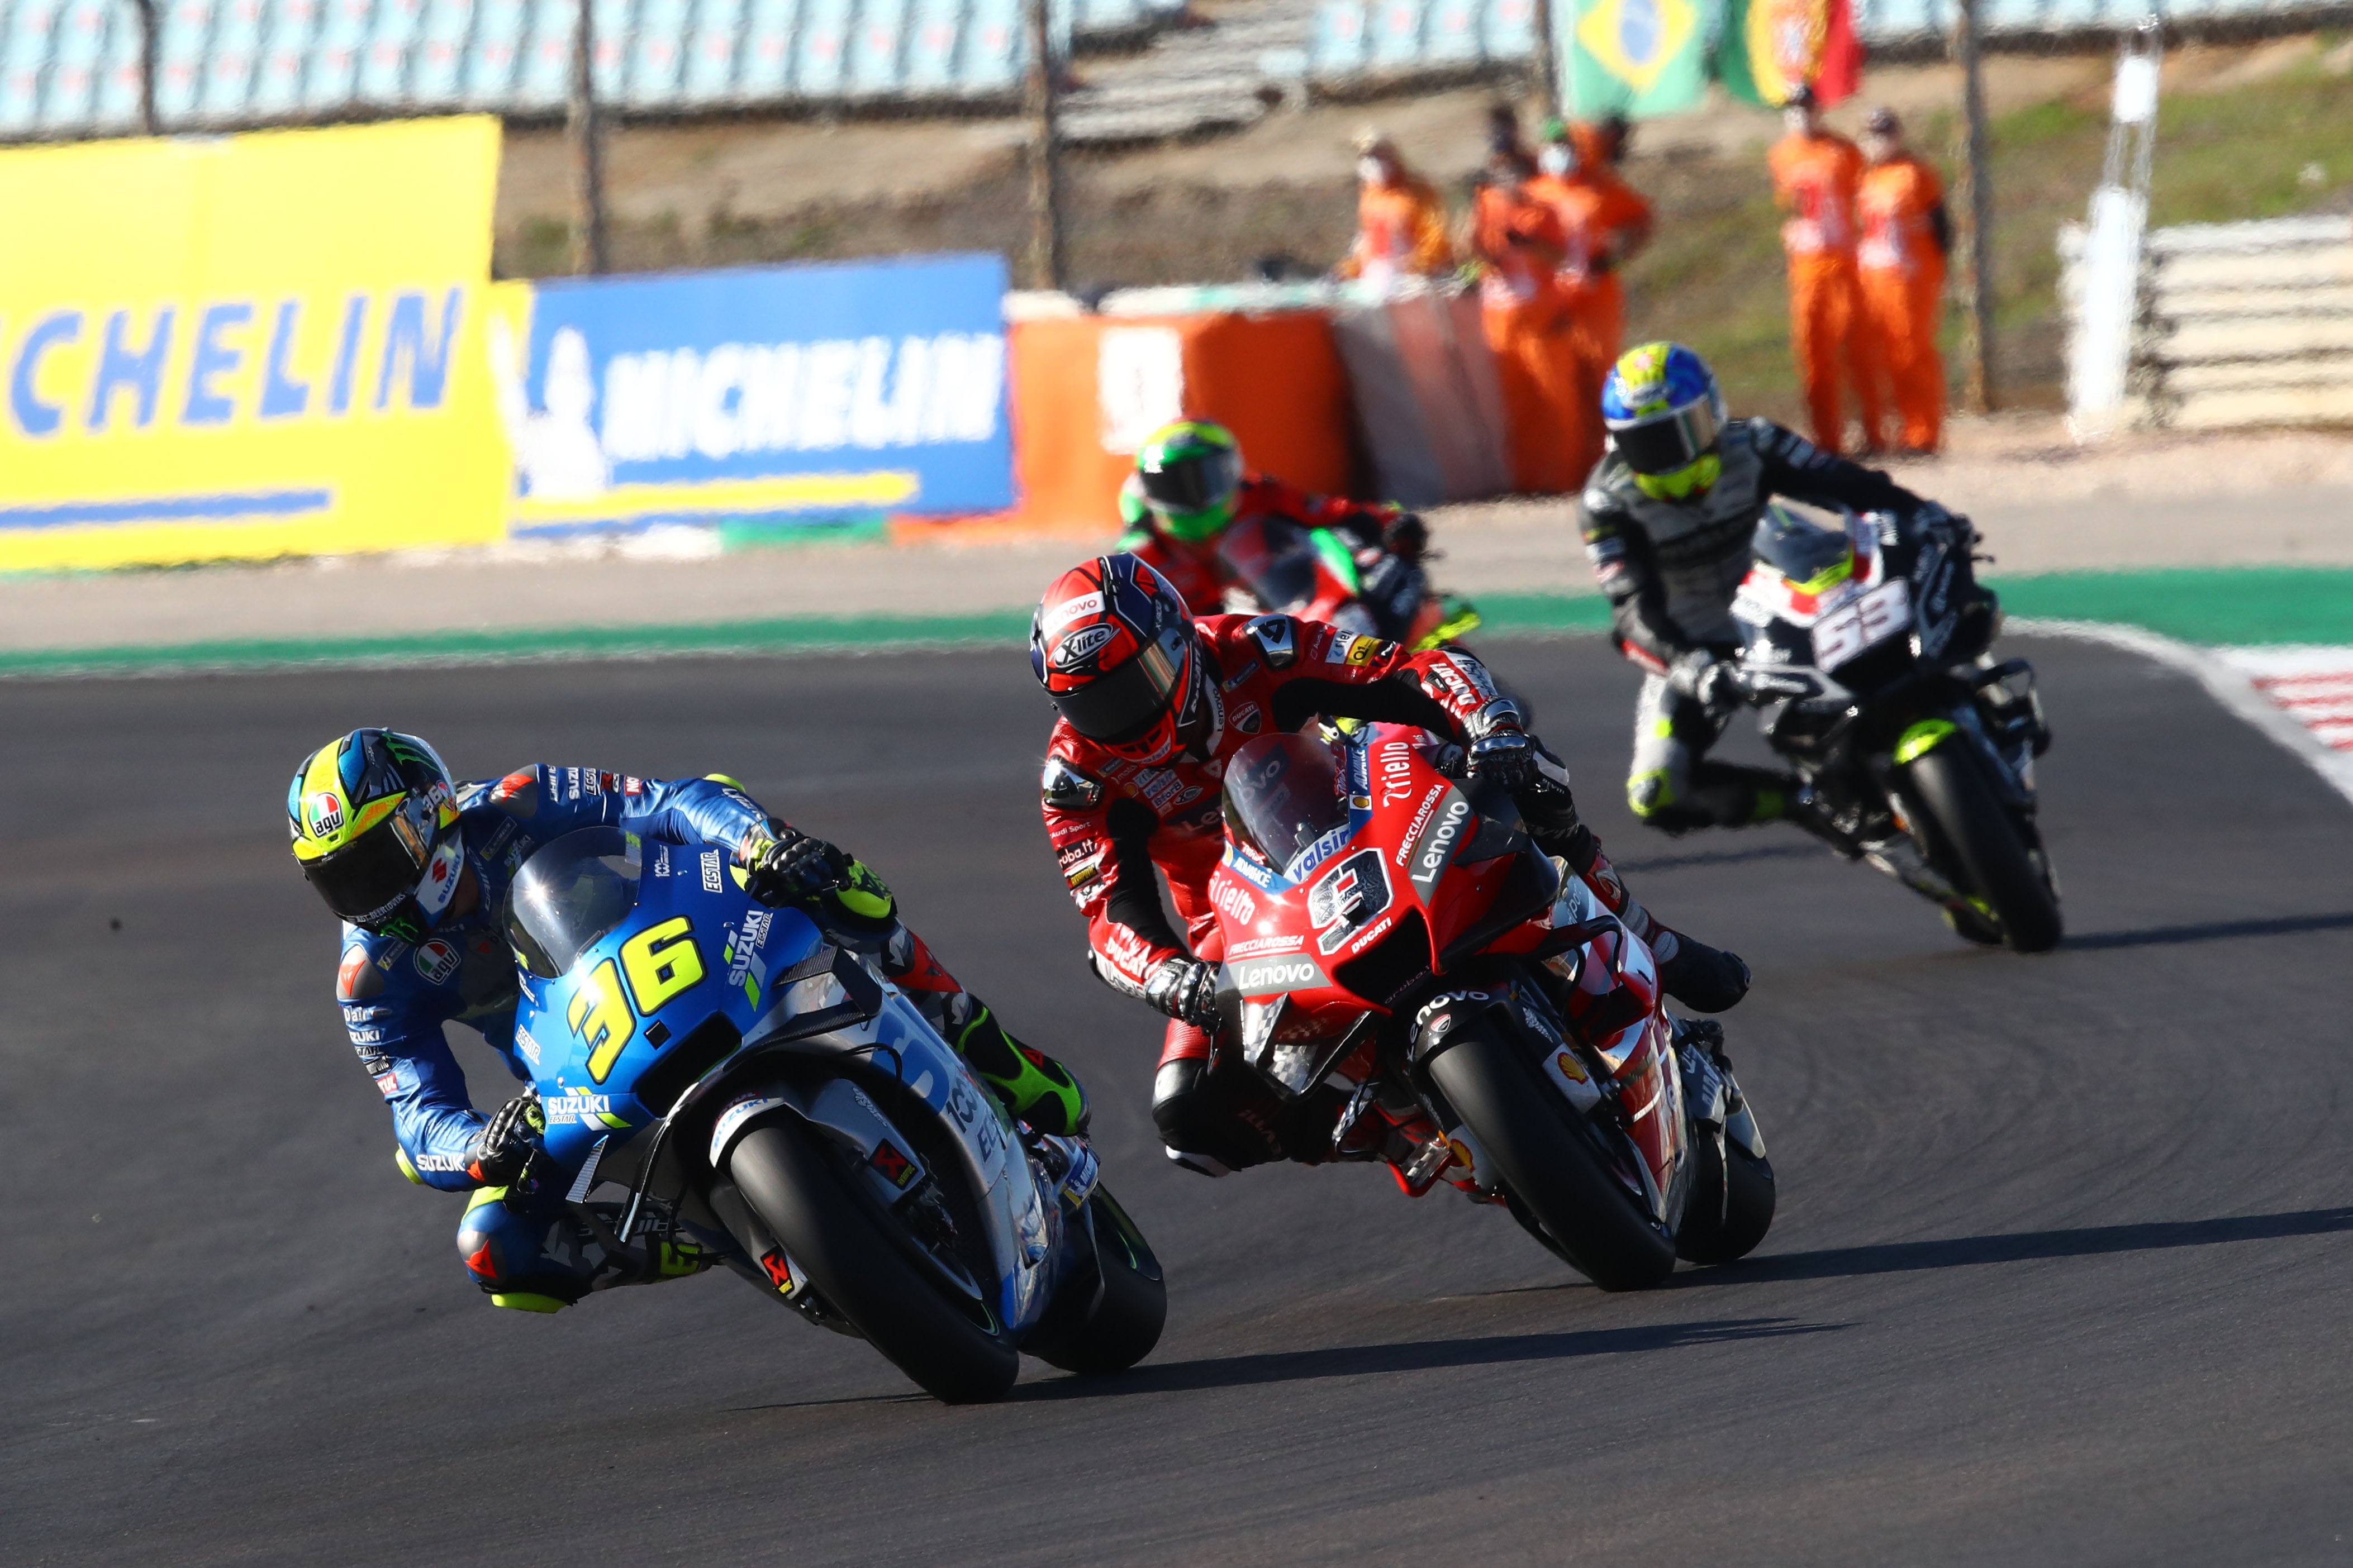 Joan Mir Suzuki Algarve MotoGP 2020